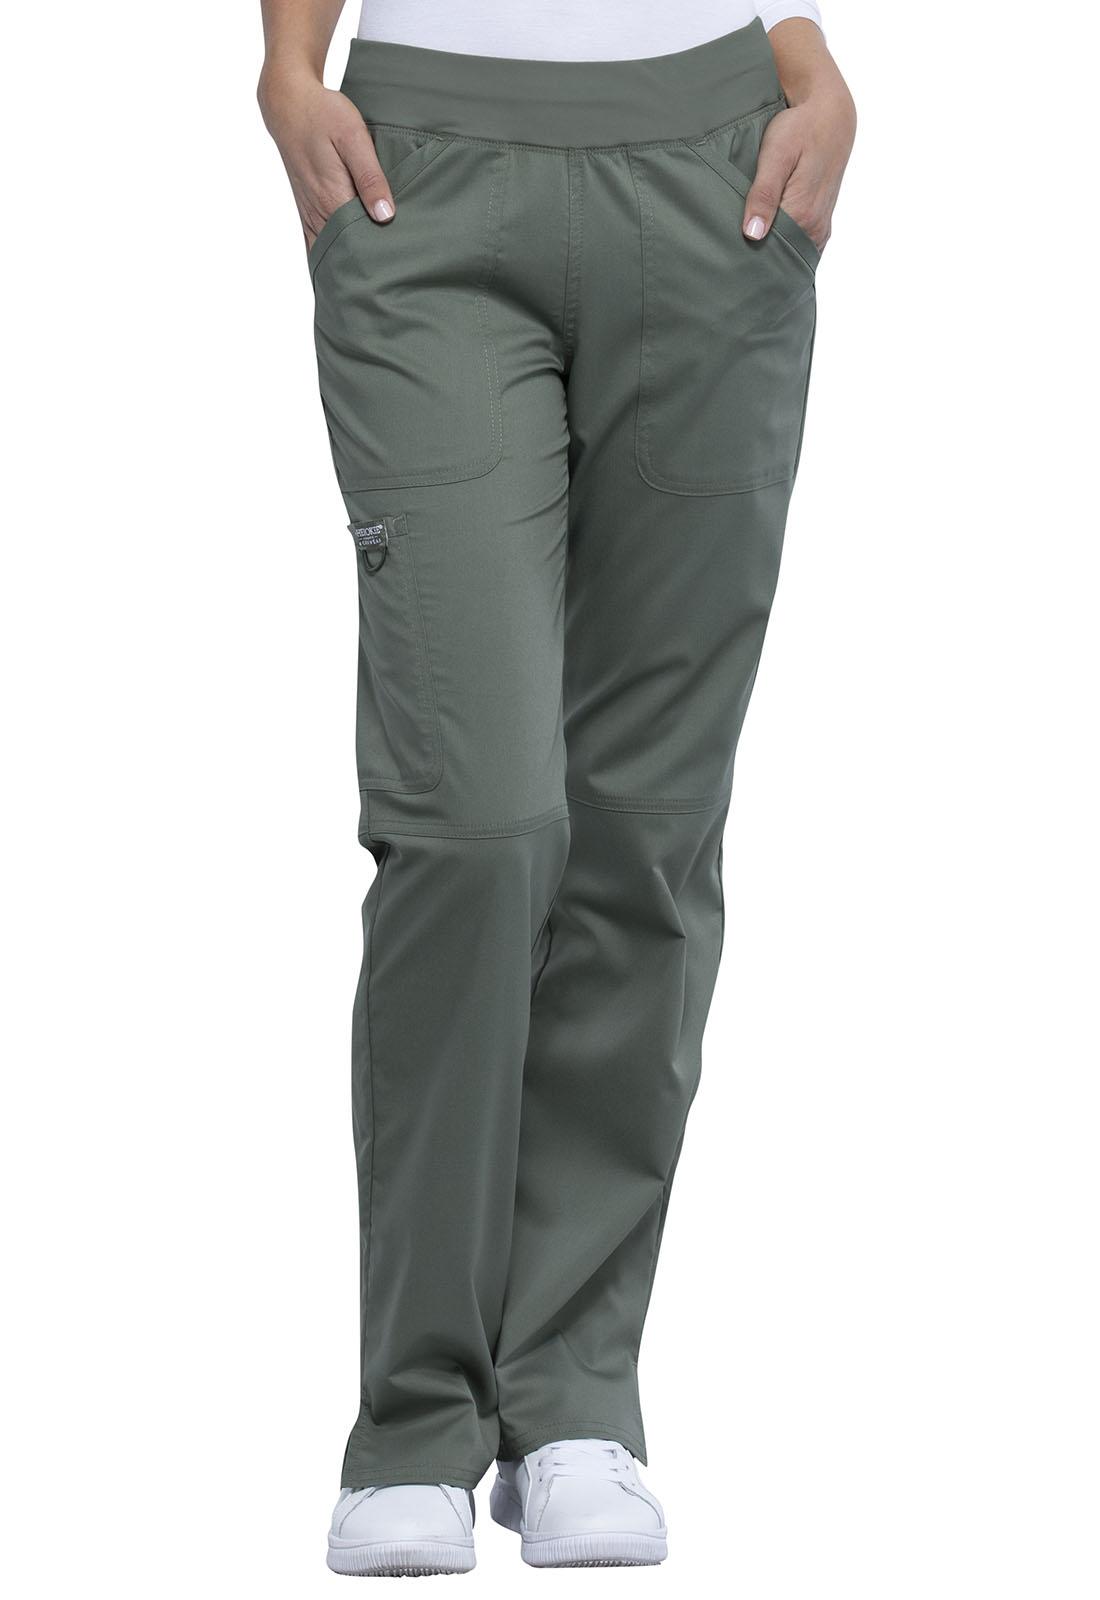 Cherokee Workwear Revolution Mid Rise Straight Leg Pull-on Pant Petite WW110P